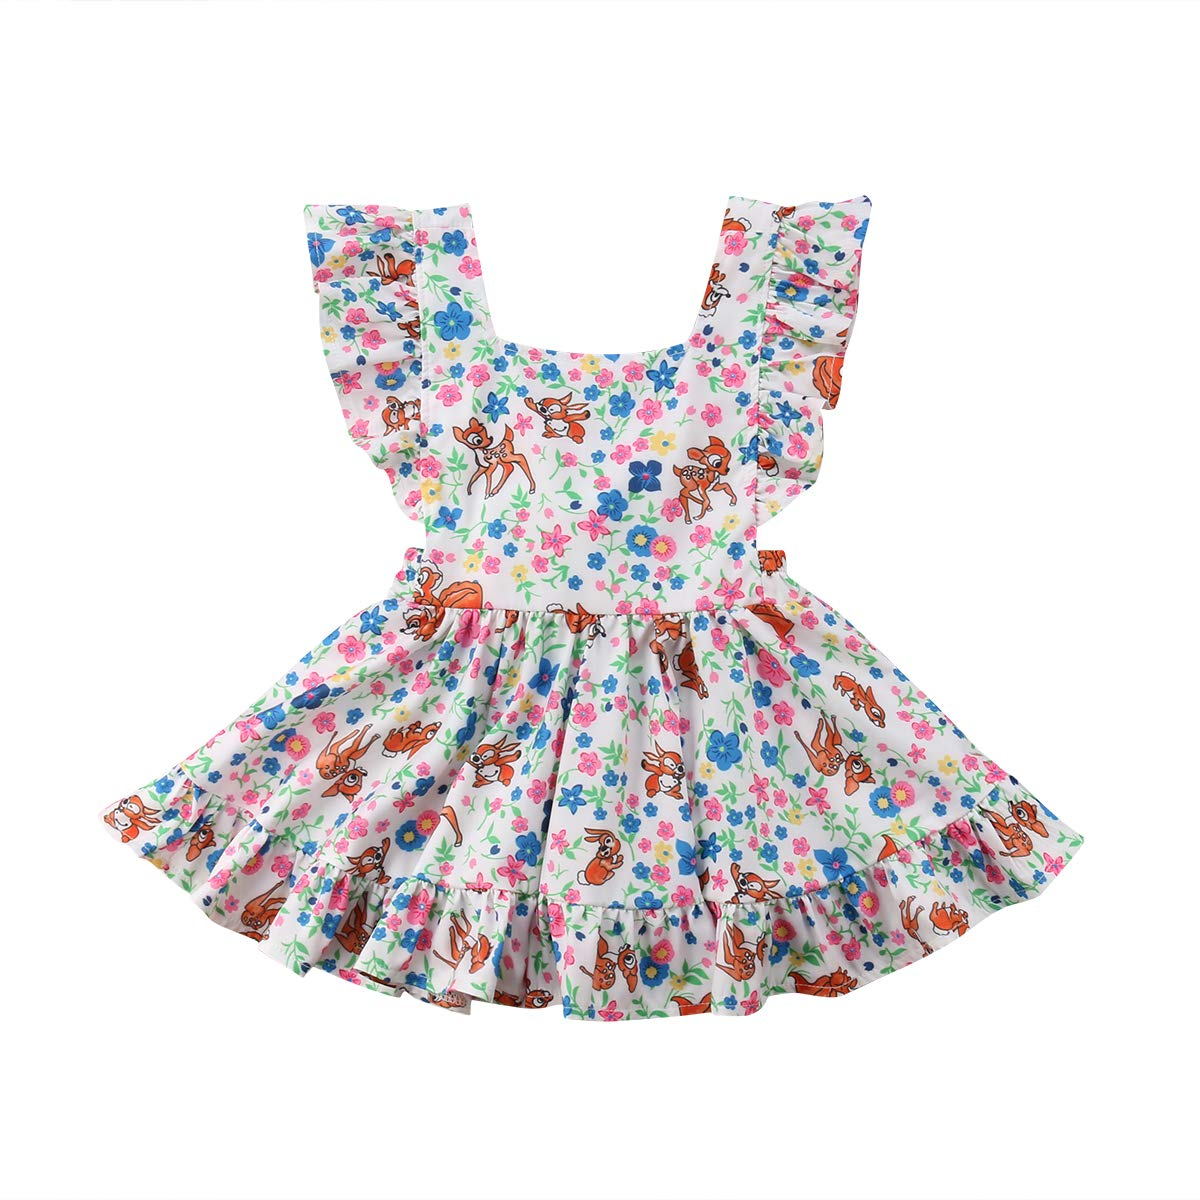 West Sweety Baby Girls Toddler Girls Ruffle Sleeve Floral Print Animal Print Dresses Cute Princess Dresses